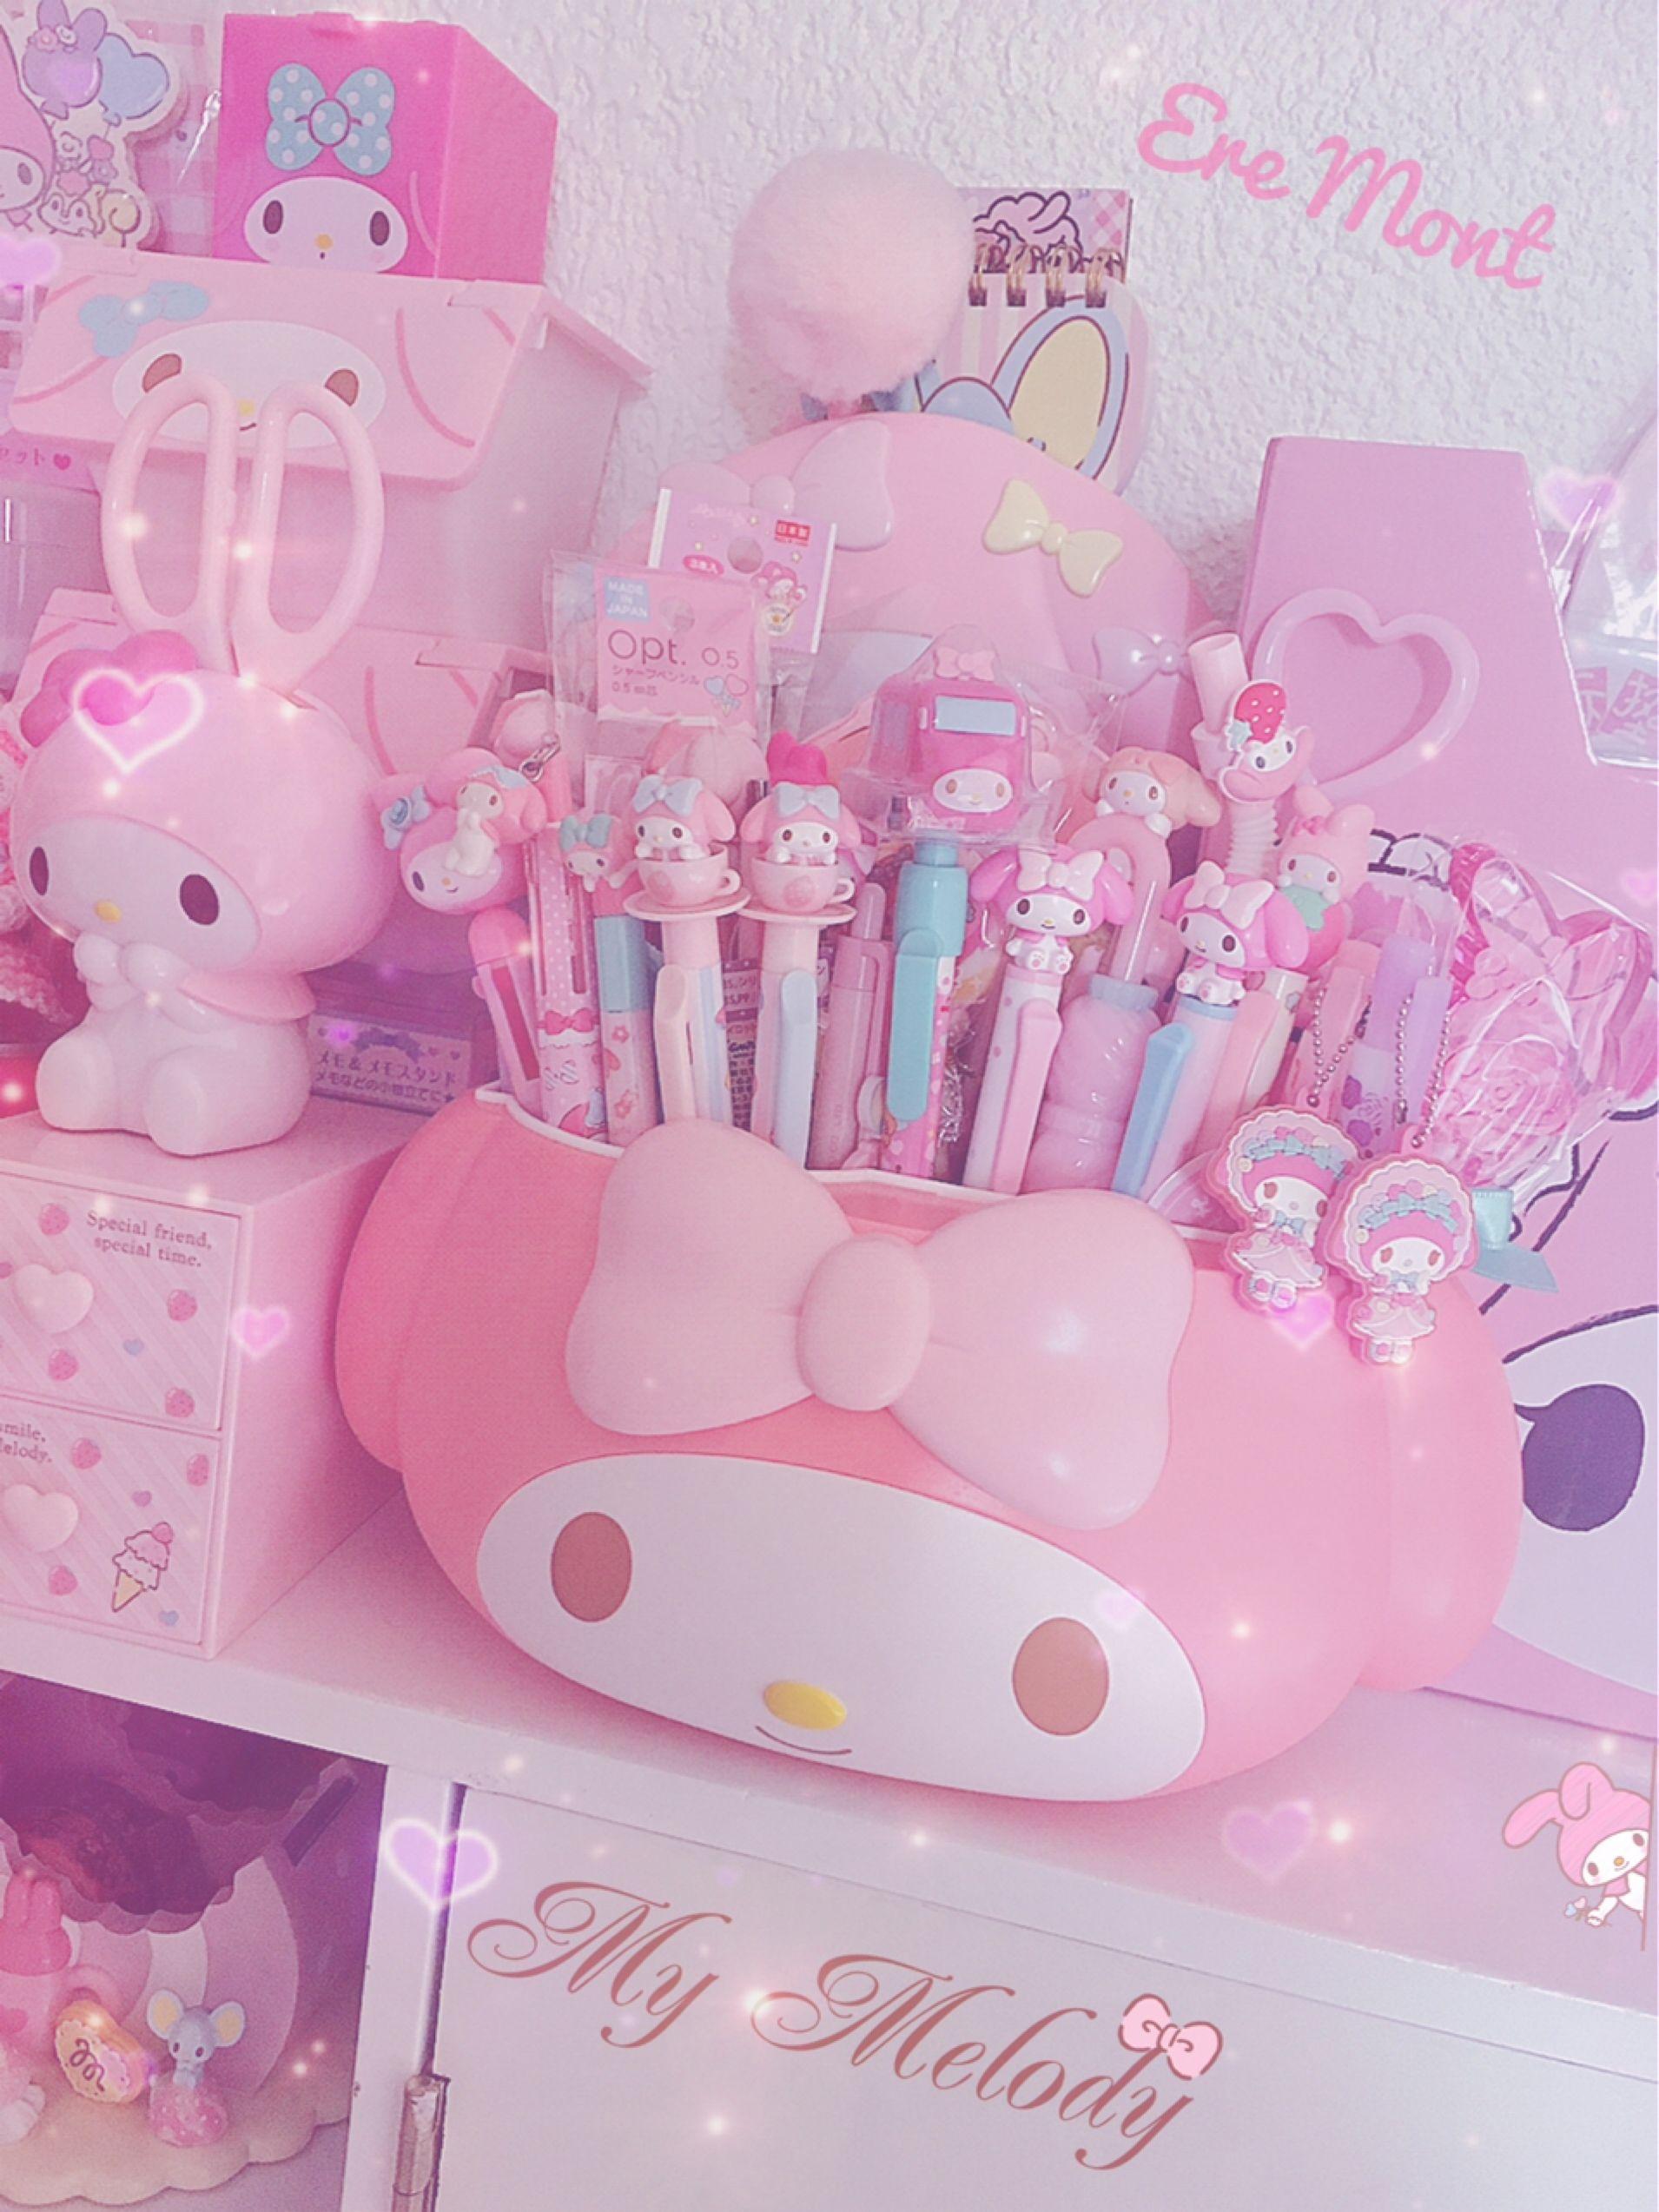 Kawaii Room With Pink Things Anime Otaku Room Kawaii Bedroom Kawaii Room